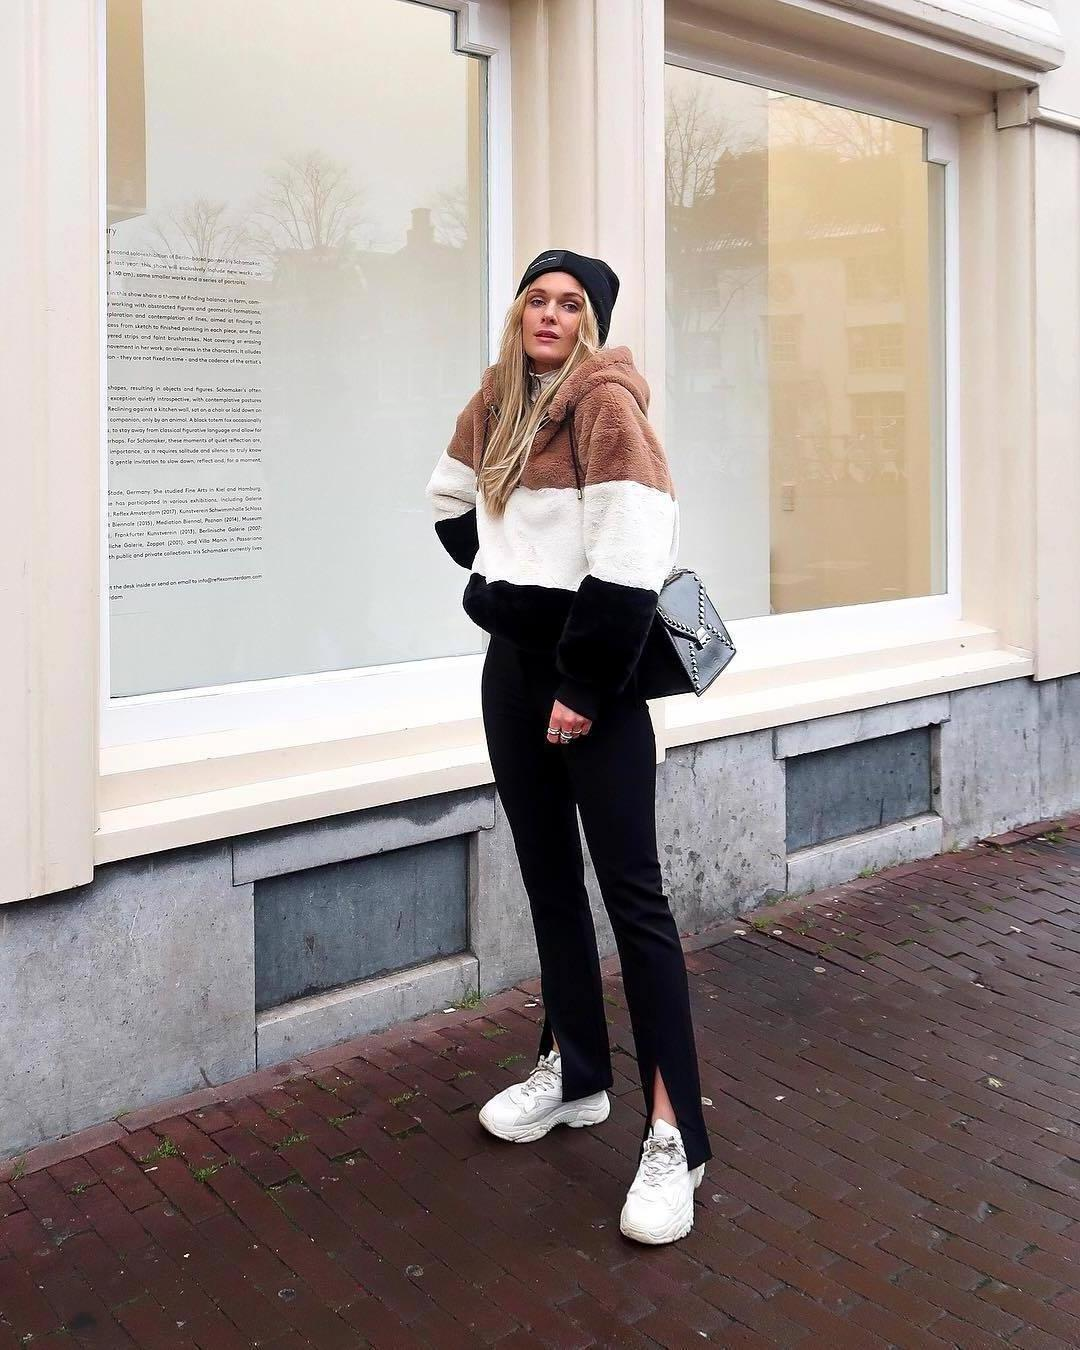 Sweater Stripes Sweater Hoodie Fau Fur Stripes White Sneakers Black Pants Slit Pants Black Bag Black Beanie cover image